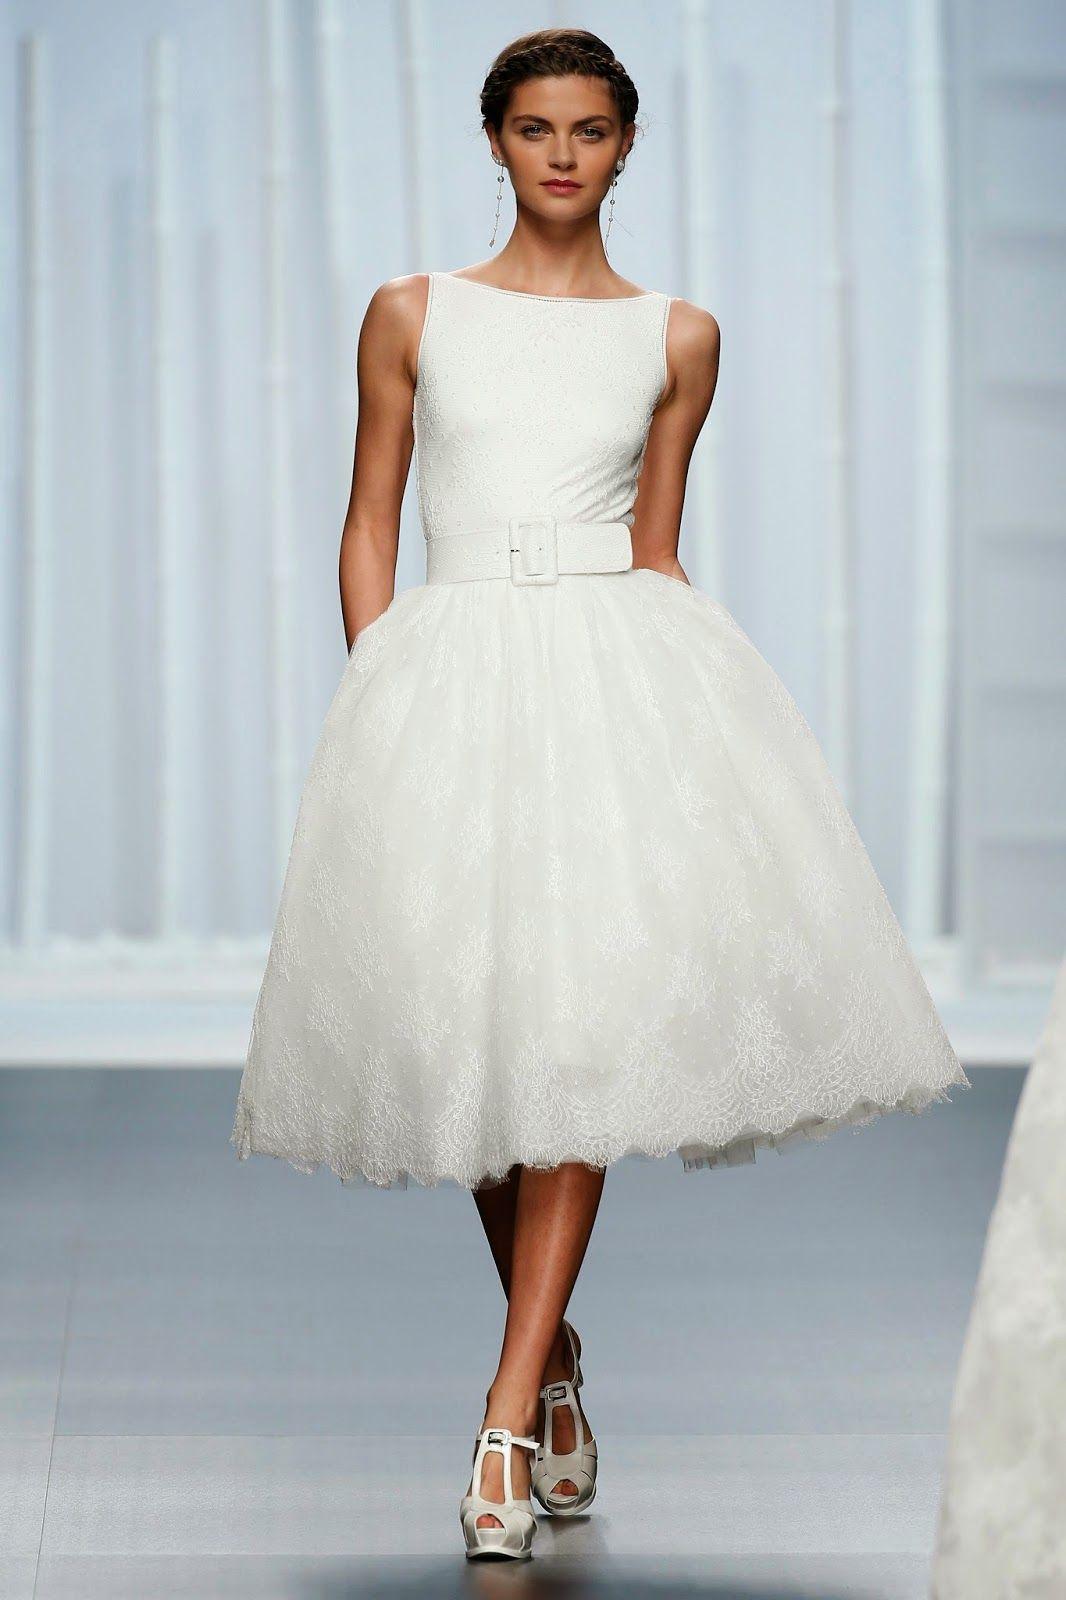 Rosa Clarà #abitosposacorto2016 #wedding #bride #bridal #nozze ...